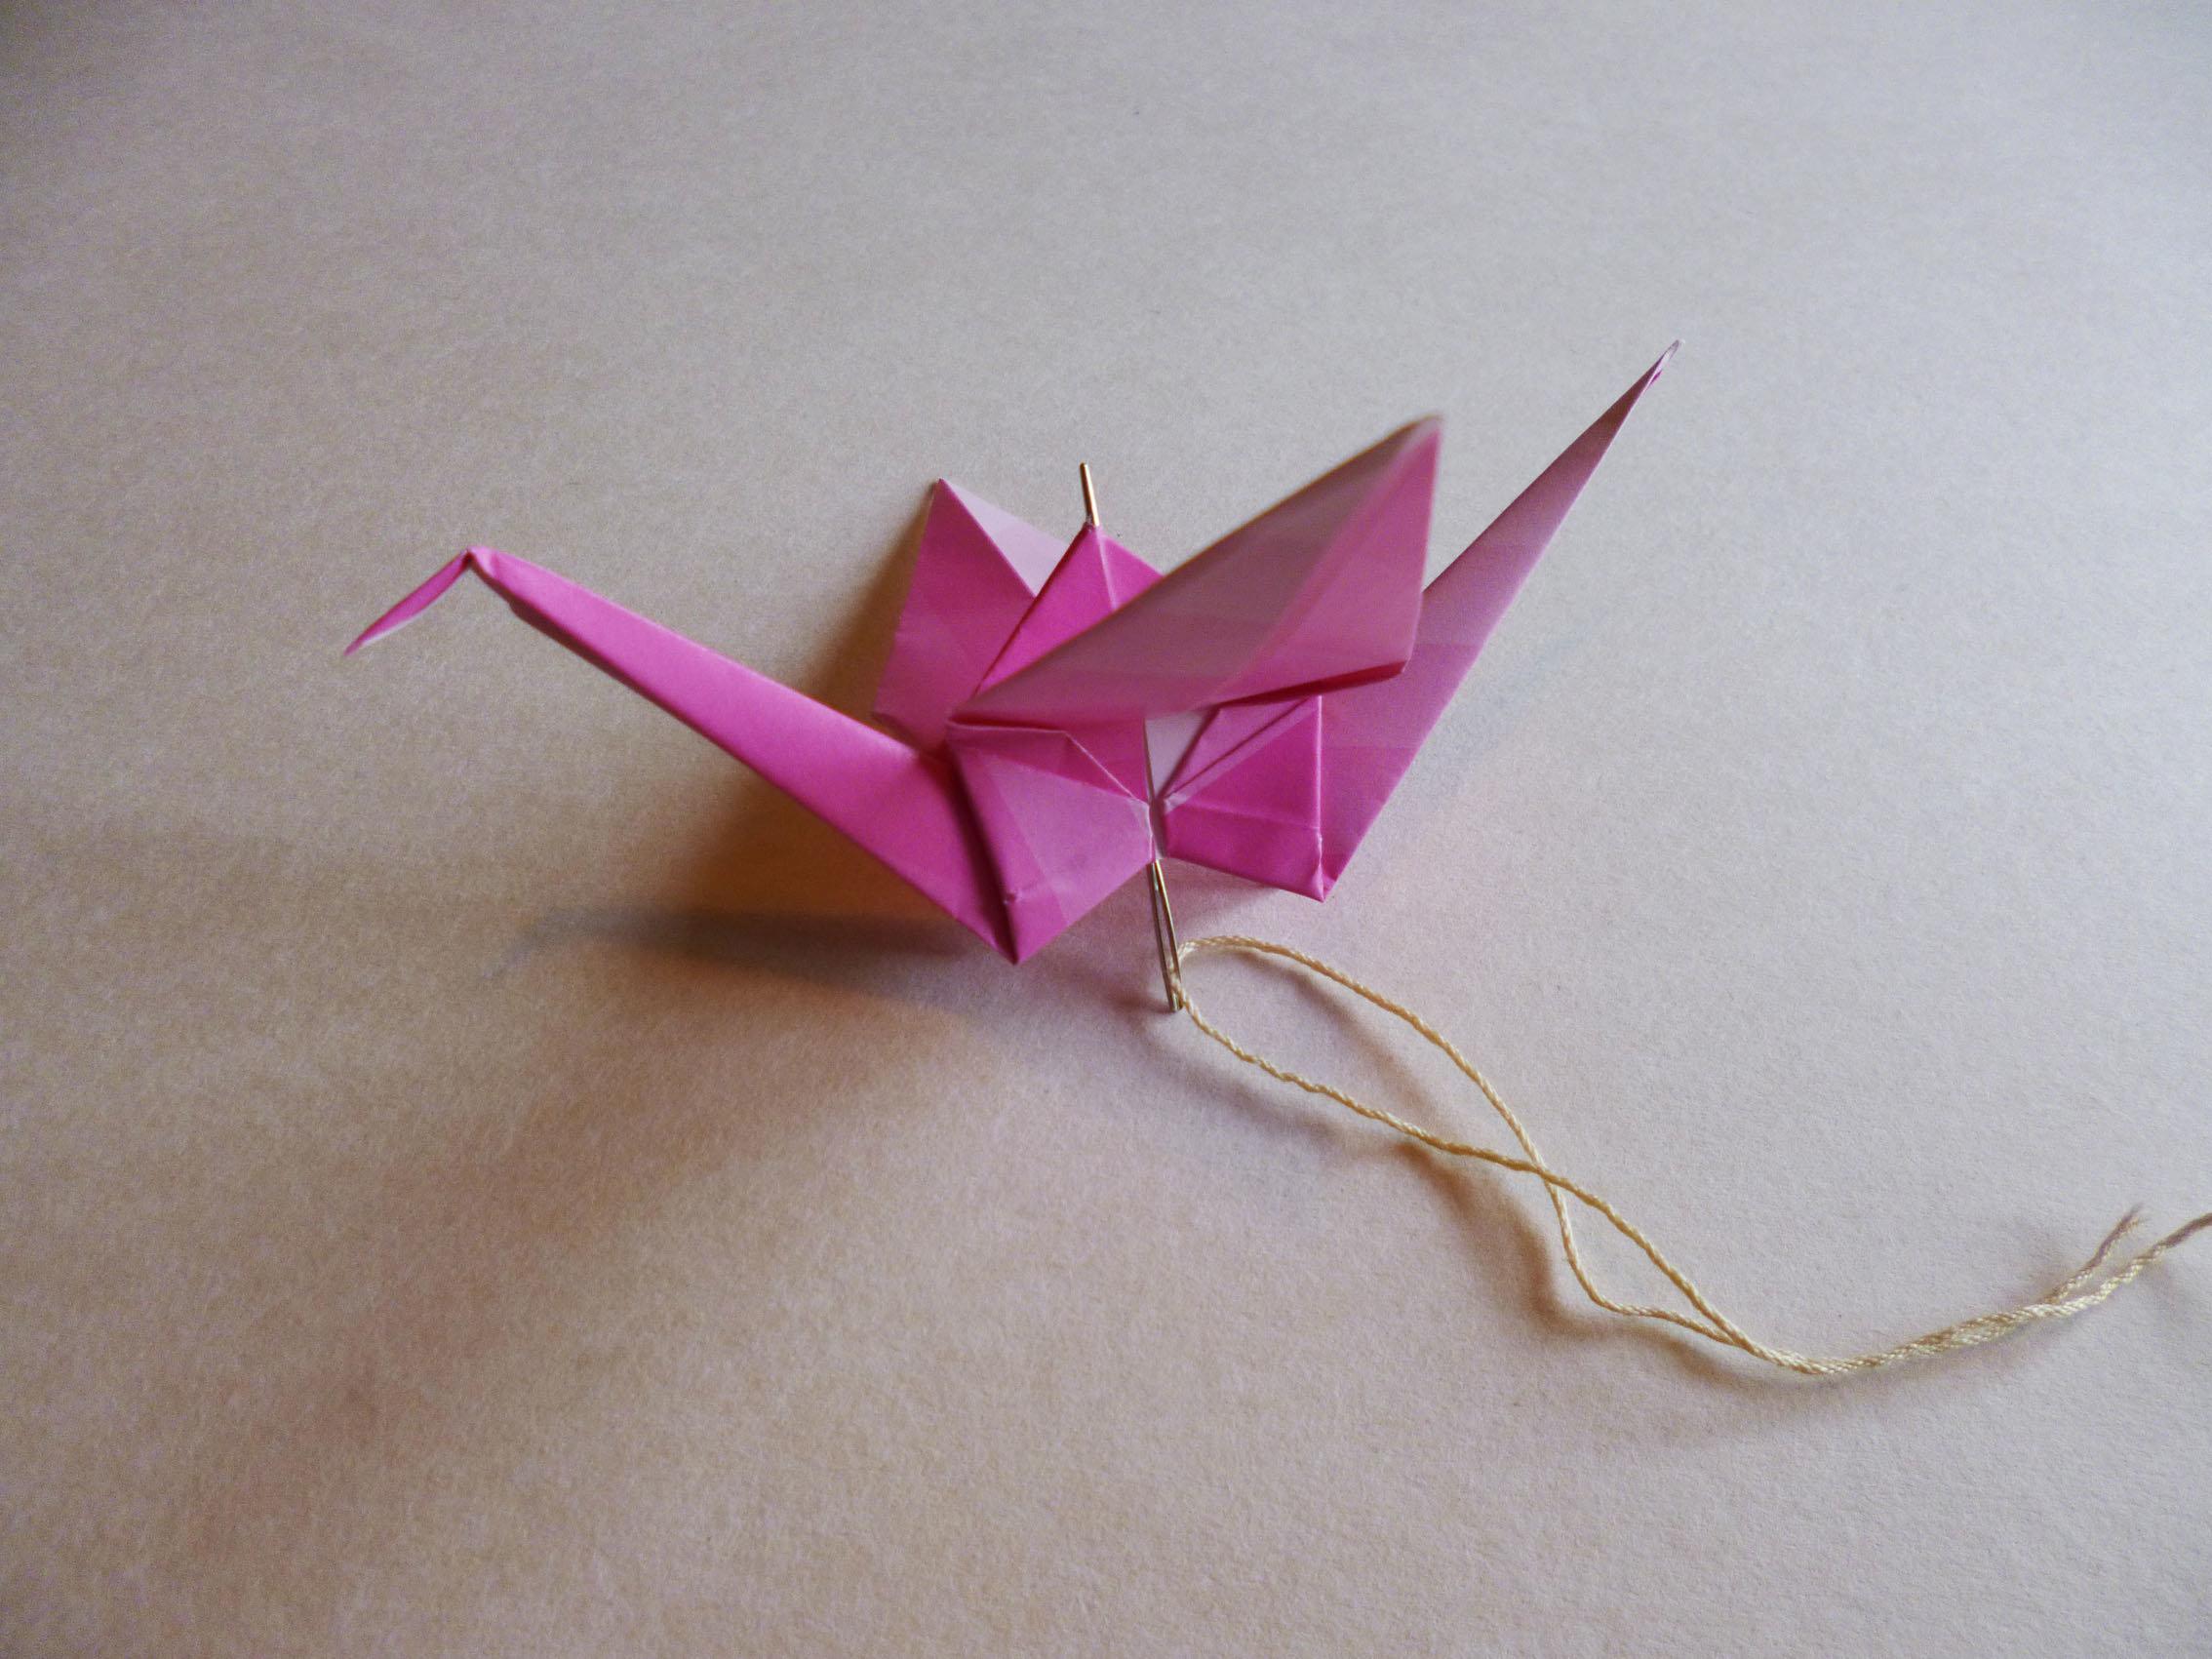 tutoriel diy autour de la grue en origami. Black Bedroom Furniture Sets. Home Design Ideas